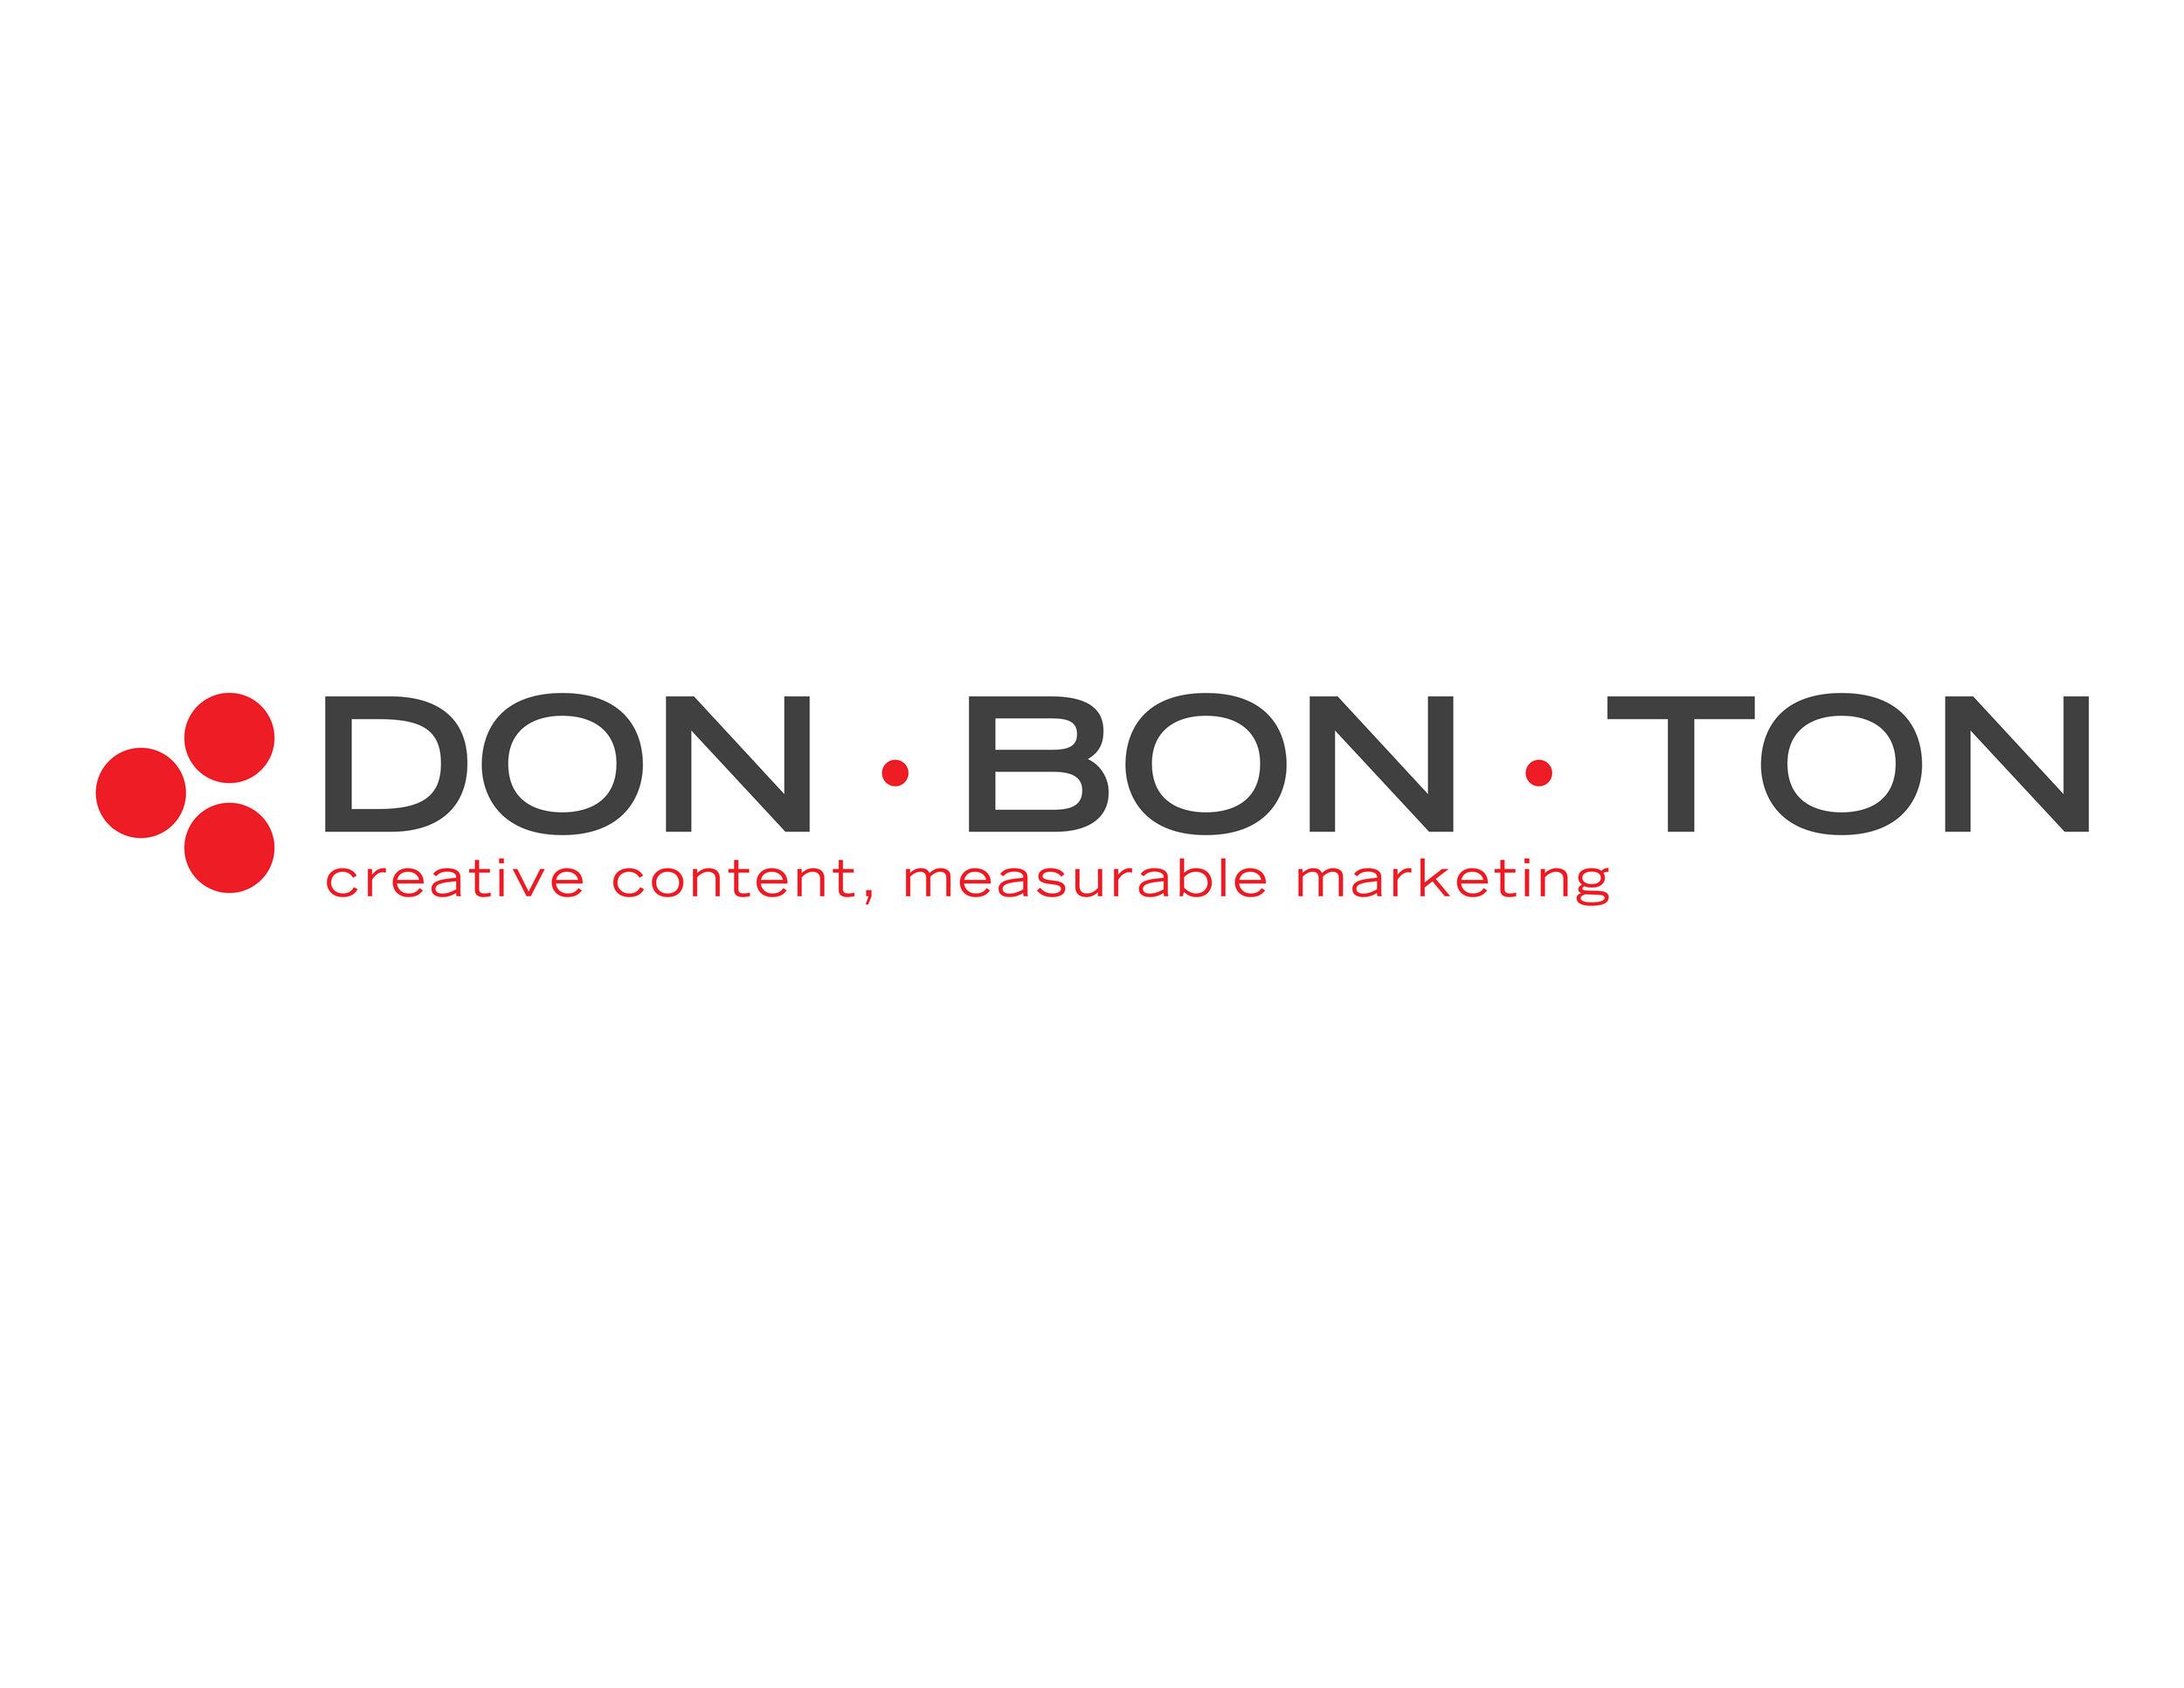 donbonton-logo.jpg